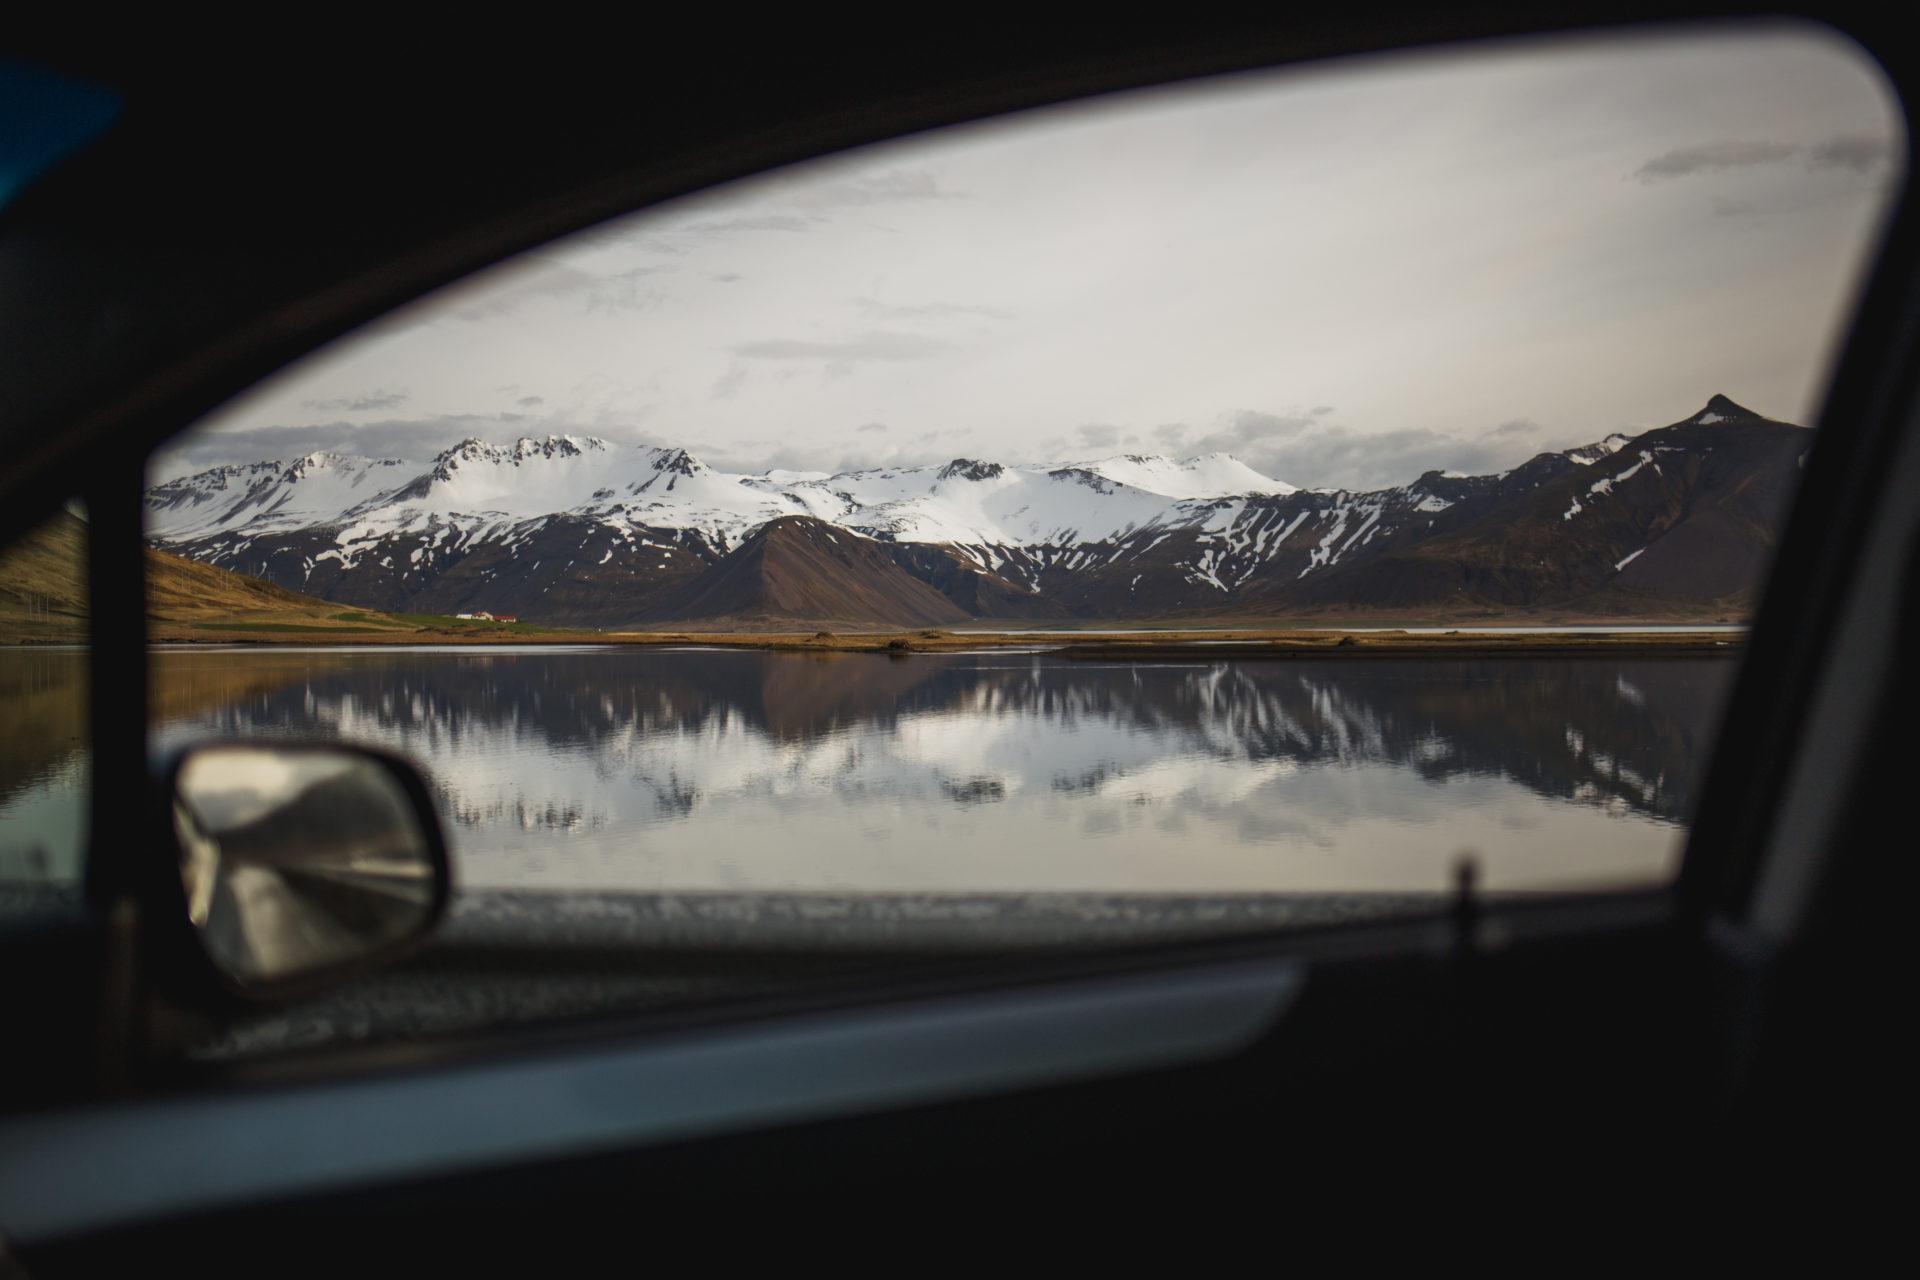 Island_Iceland_IMG_2759_Carolin-Weinkopf